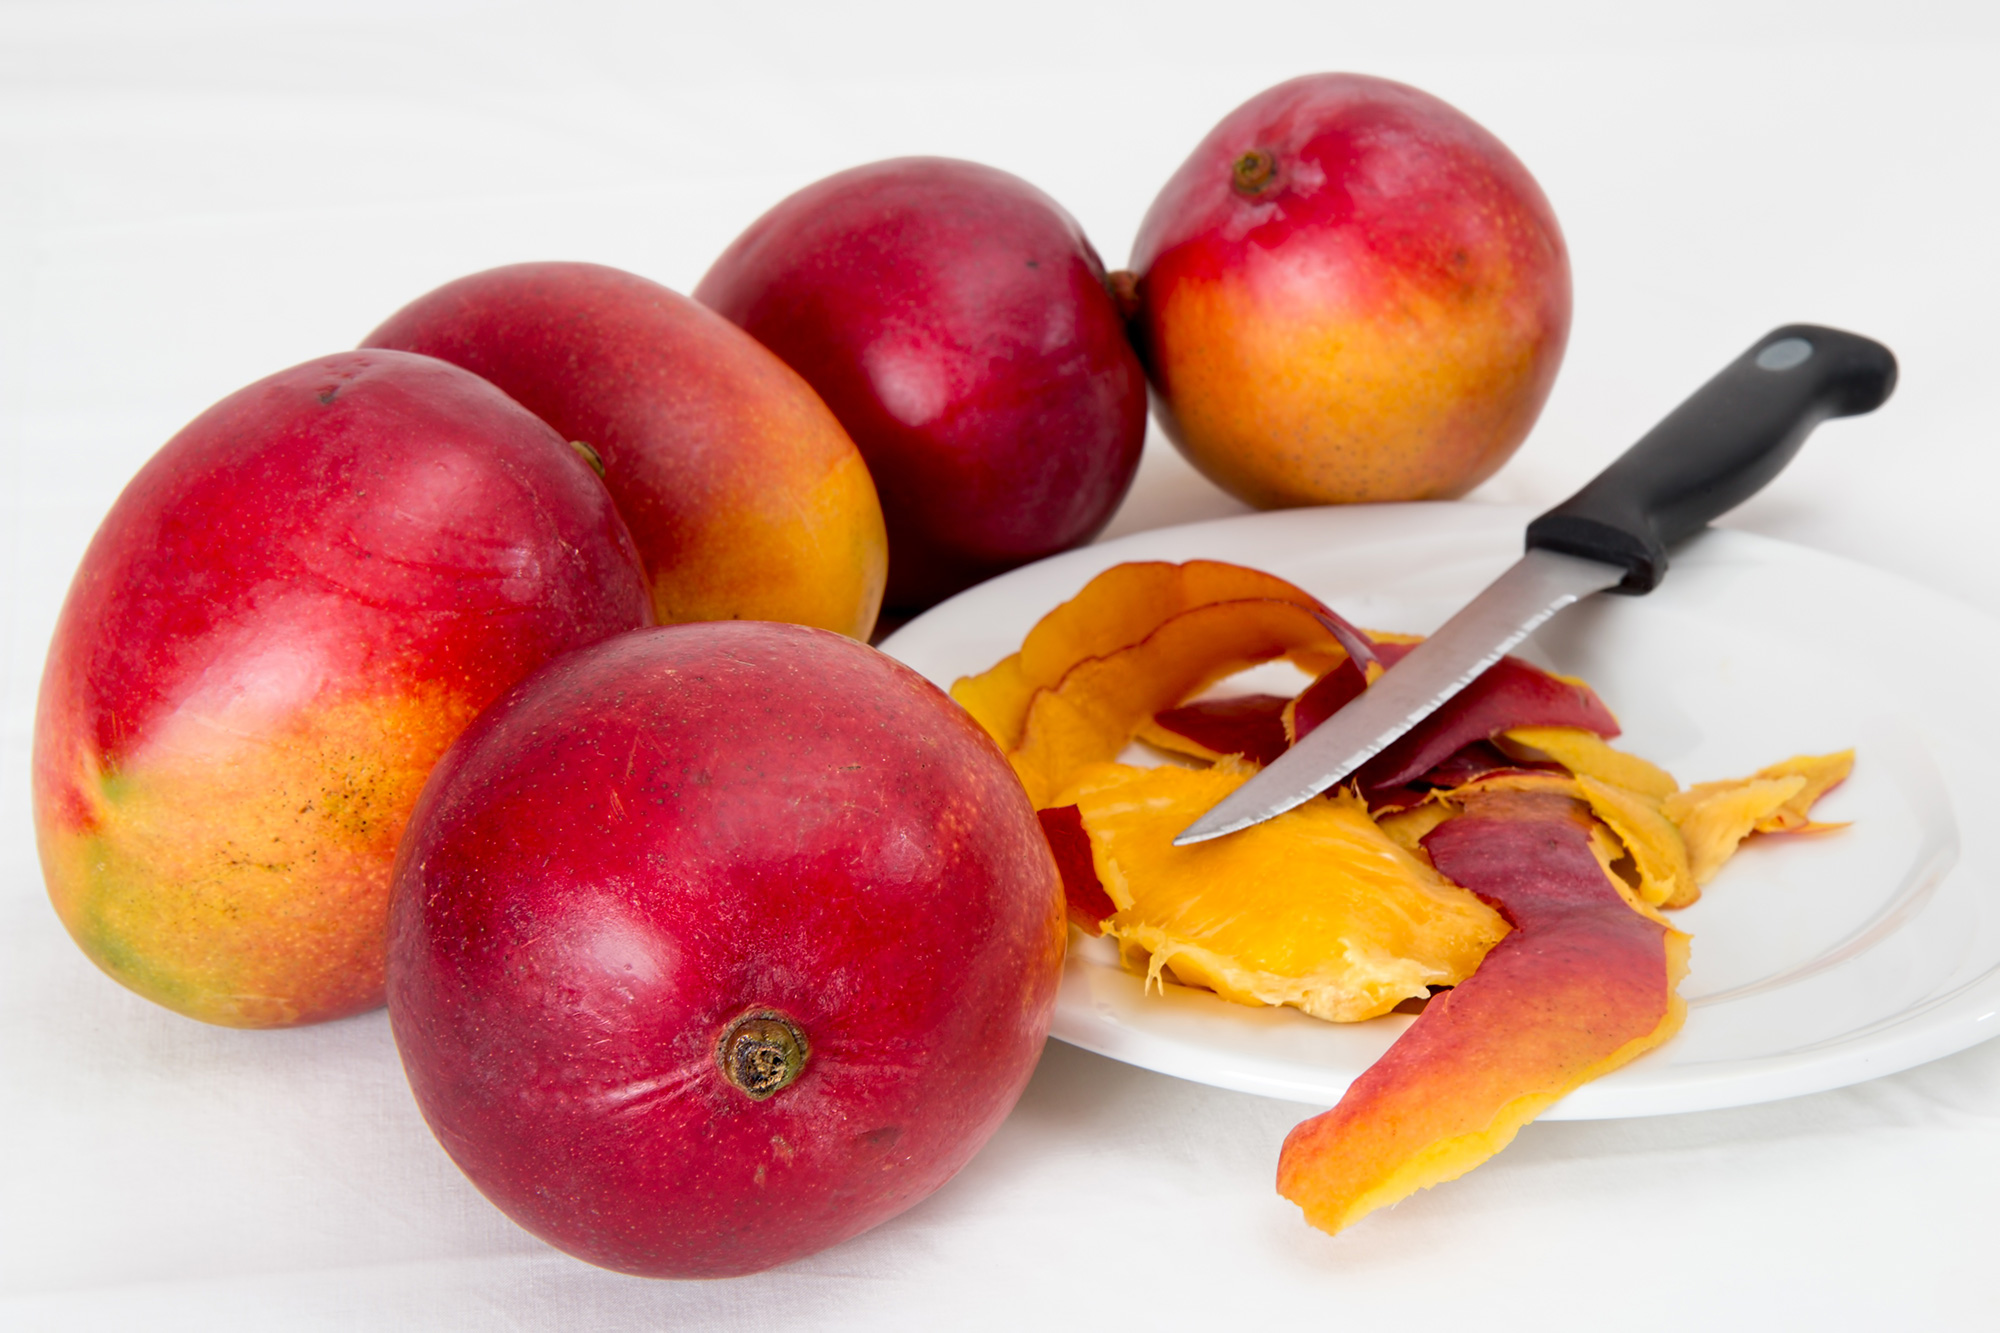 Some Mango's Ready to be Eaten in Cuba